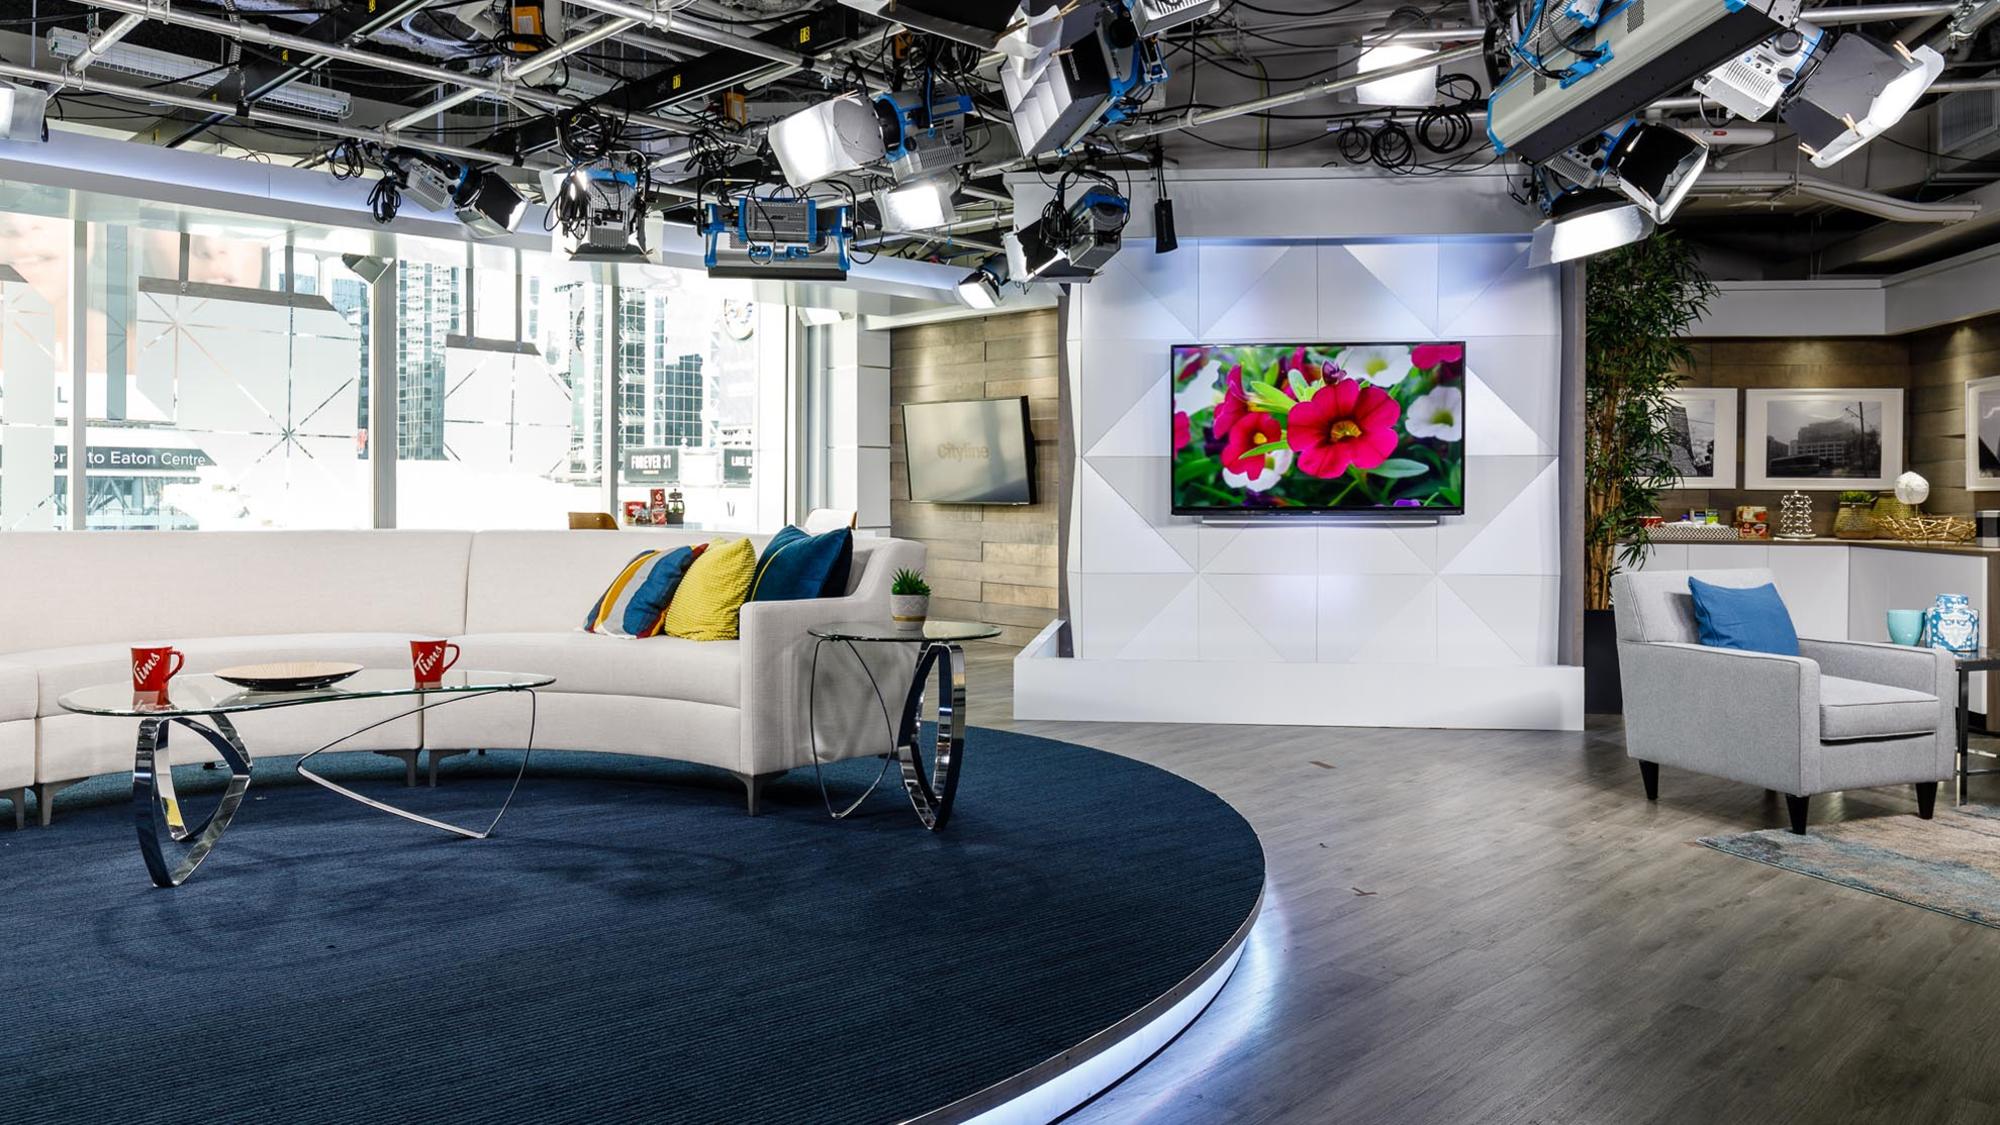 ncs_bt-breakfast-television-canada-tv-studio_0010